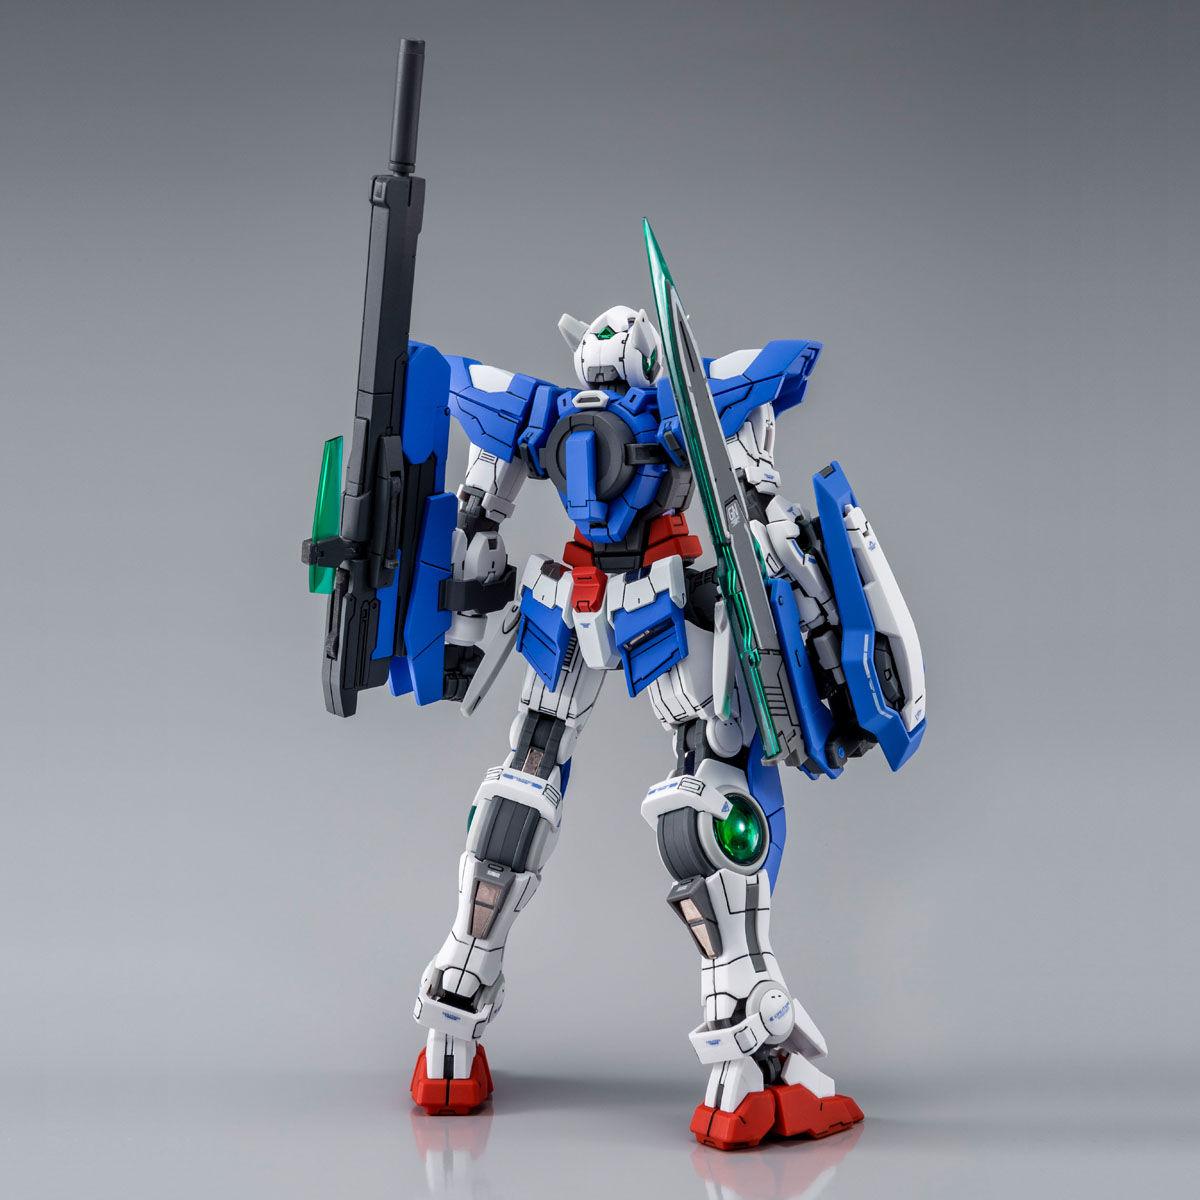 P Bandai Rg 1 144 Gundam Exia Repair Iii Release Info